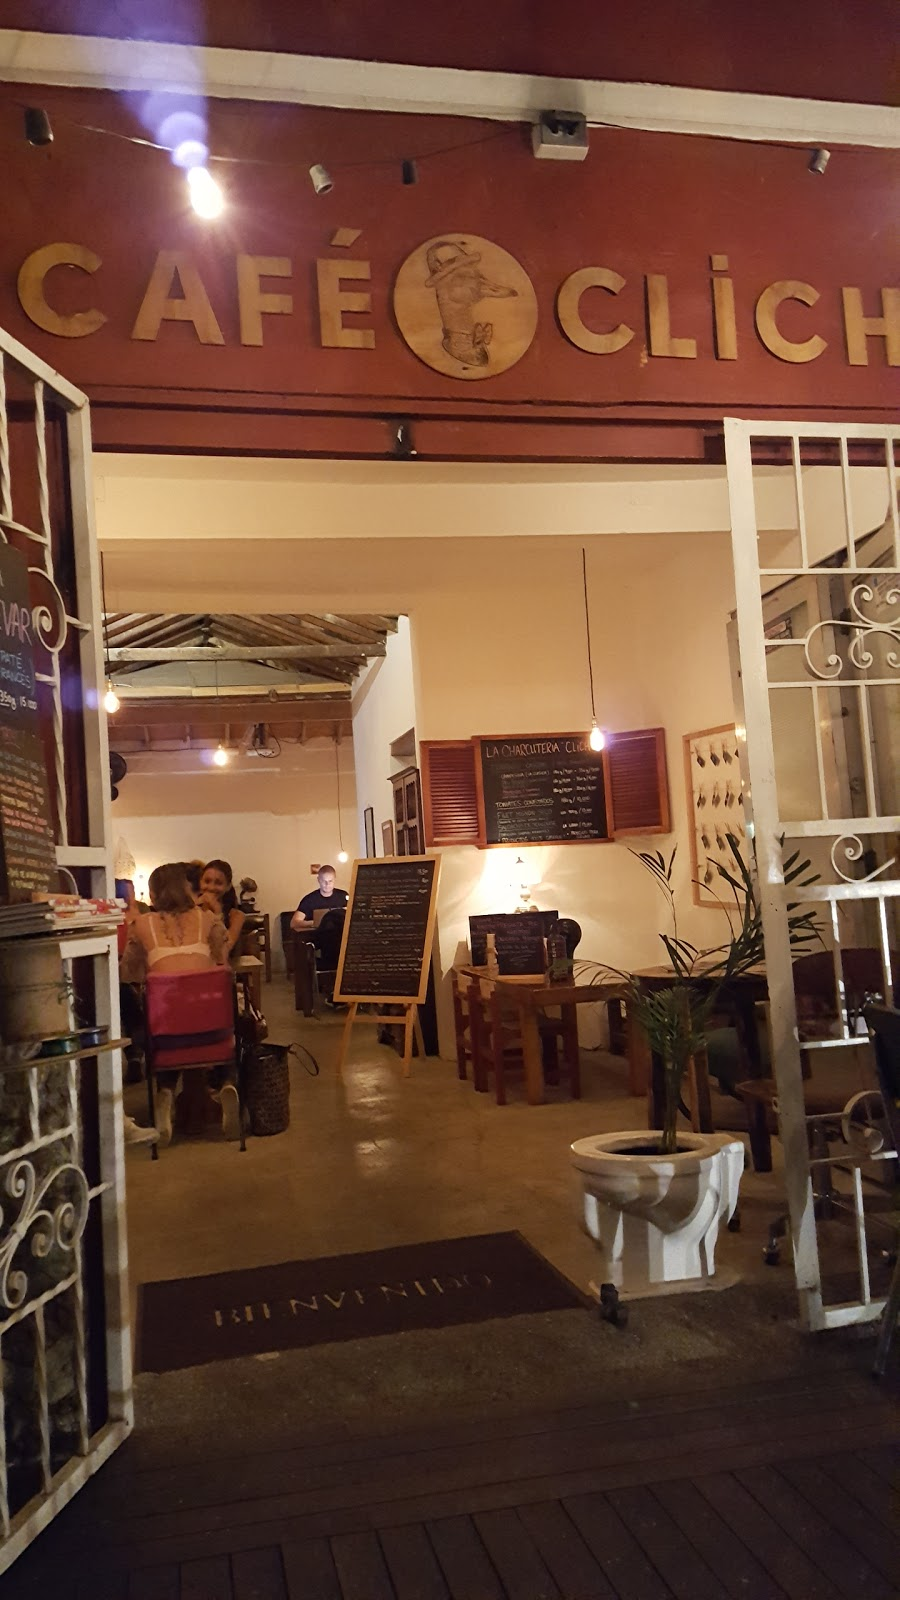 Café Cliché: A Work-Friendly Place in Medellin